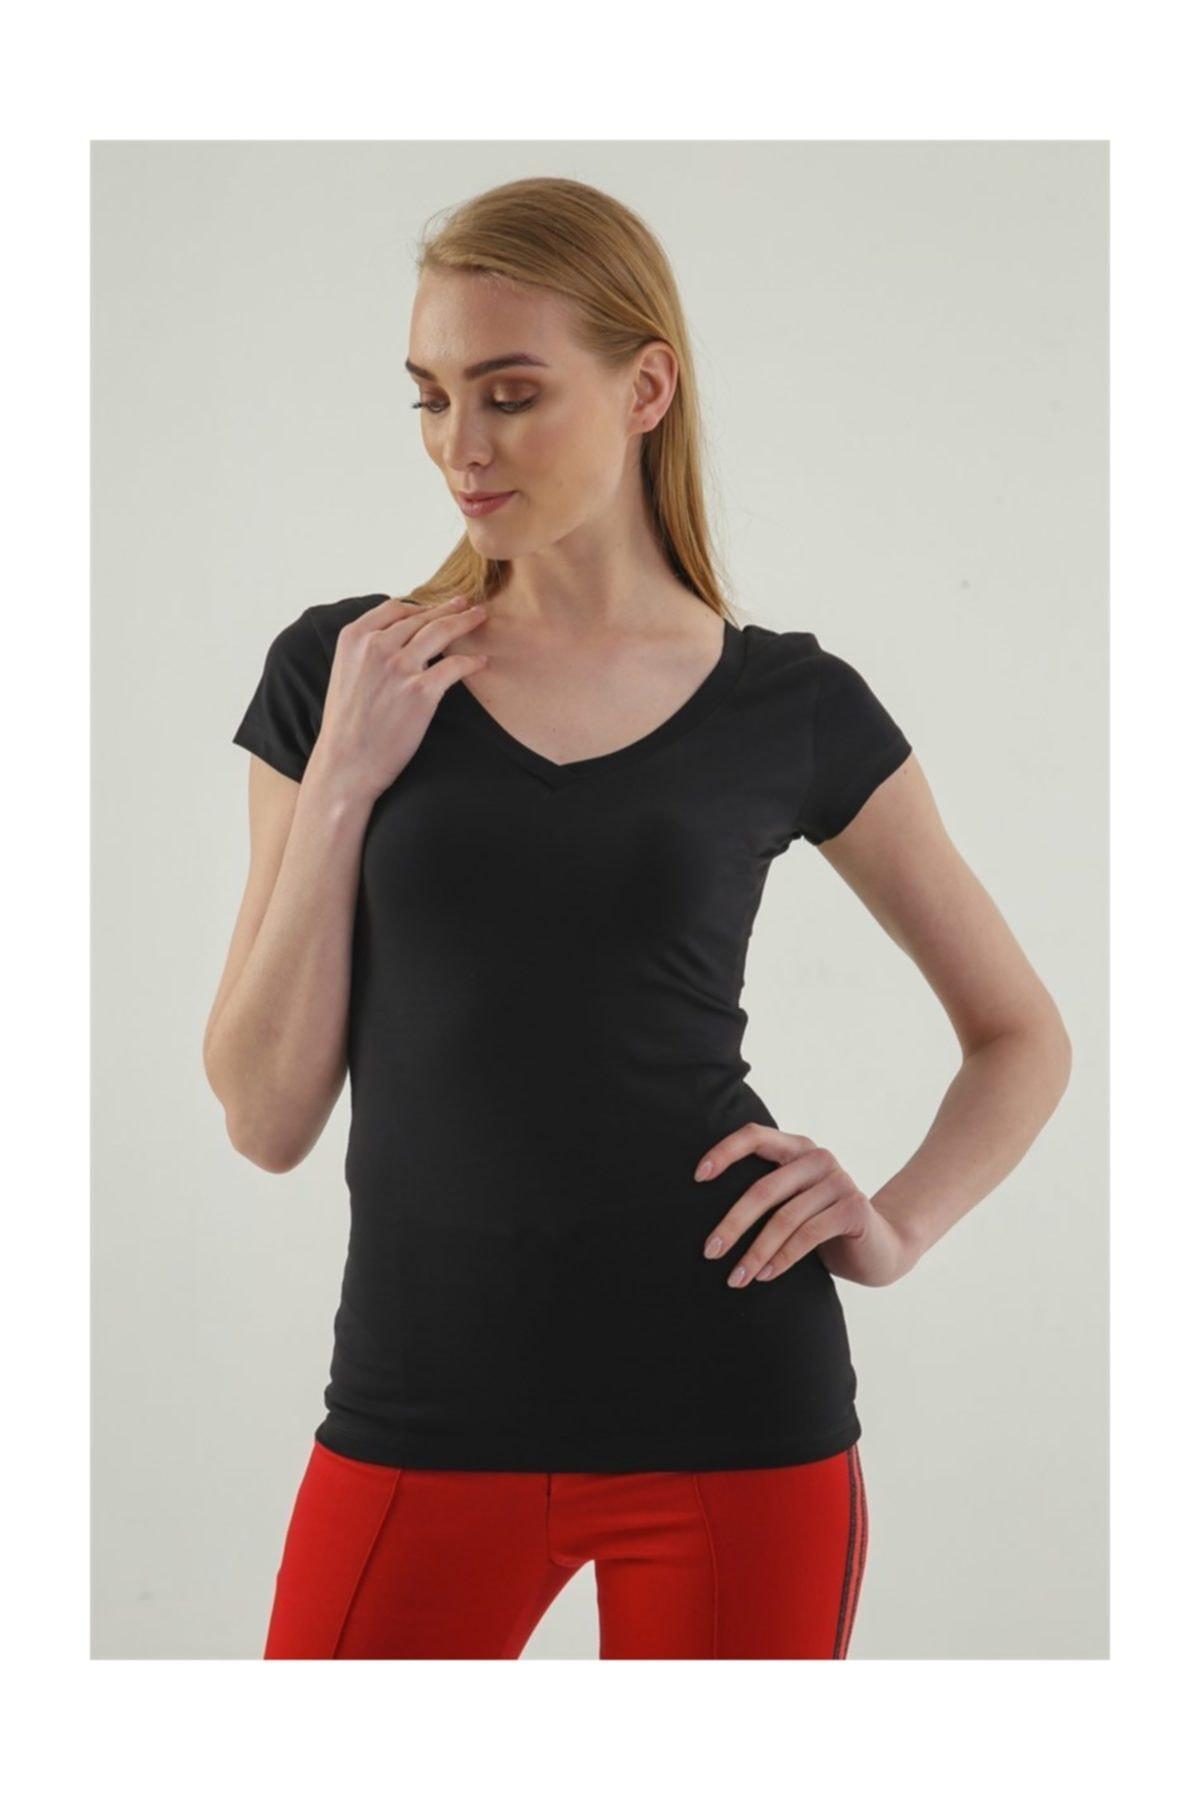 Jument Kadın Siyah Monalisa Ön Arka V Yaka Kısa Kol T-Shirt 5612 1